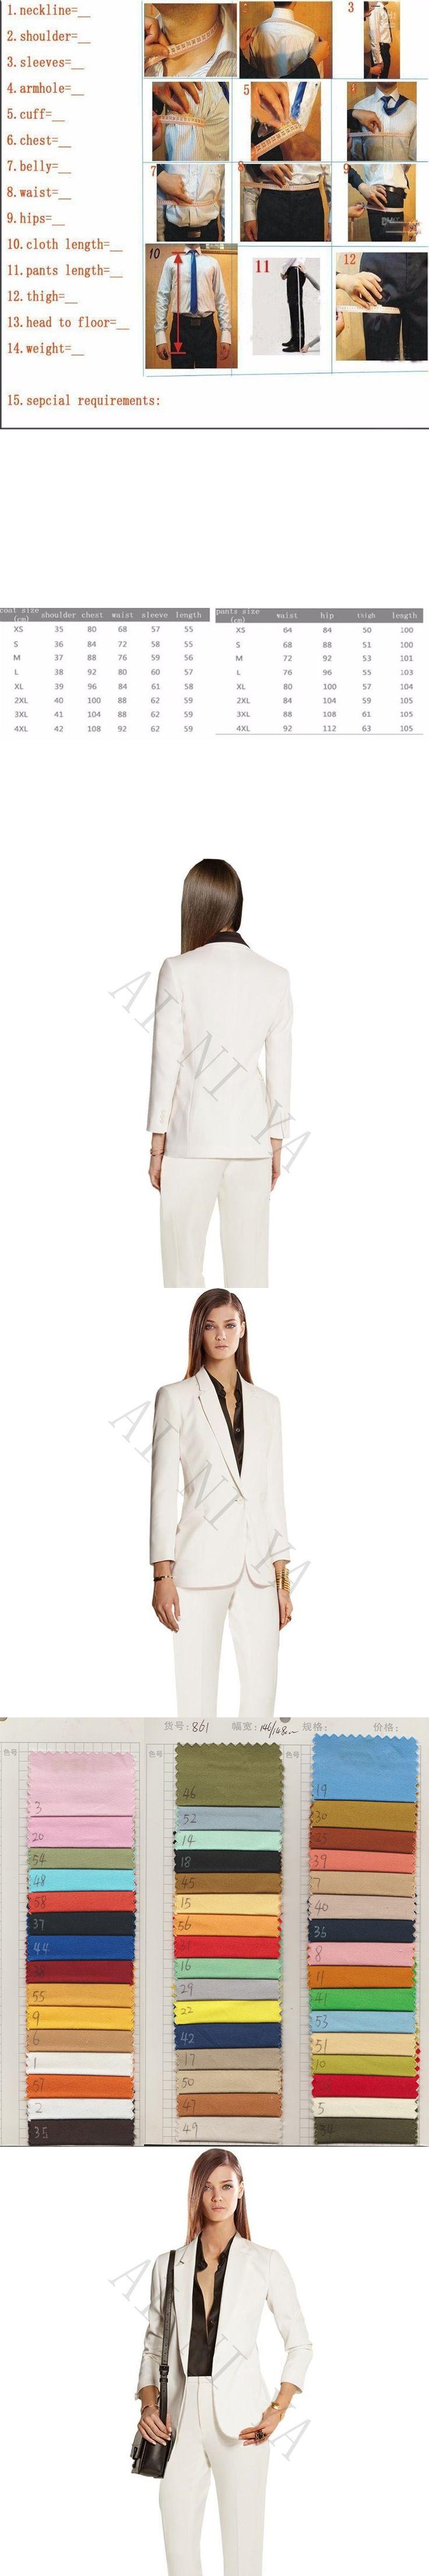 Jacket+Pants Womens Business Suits Ivory Female Office Uniform Formal Work Wear Ladies Trouser Suit 2 Piece Set Custom